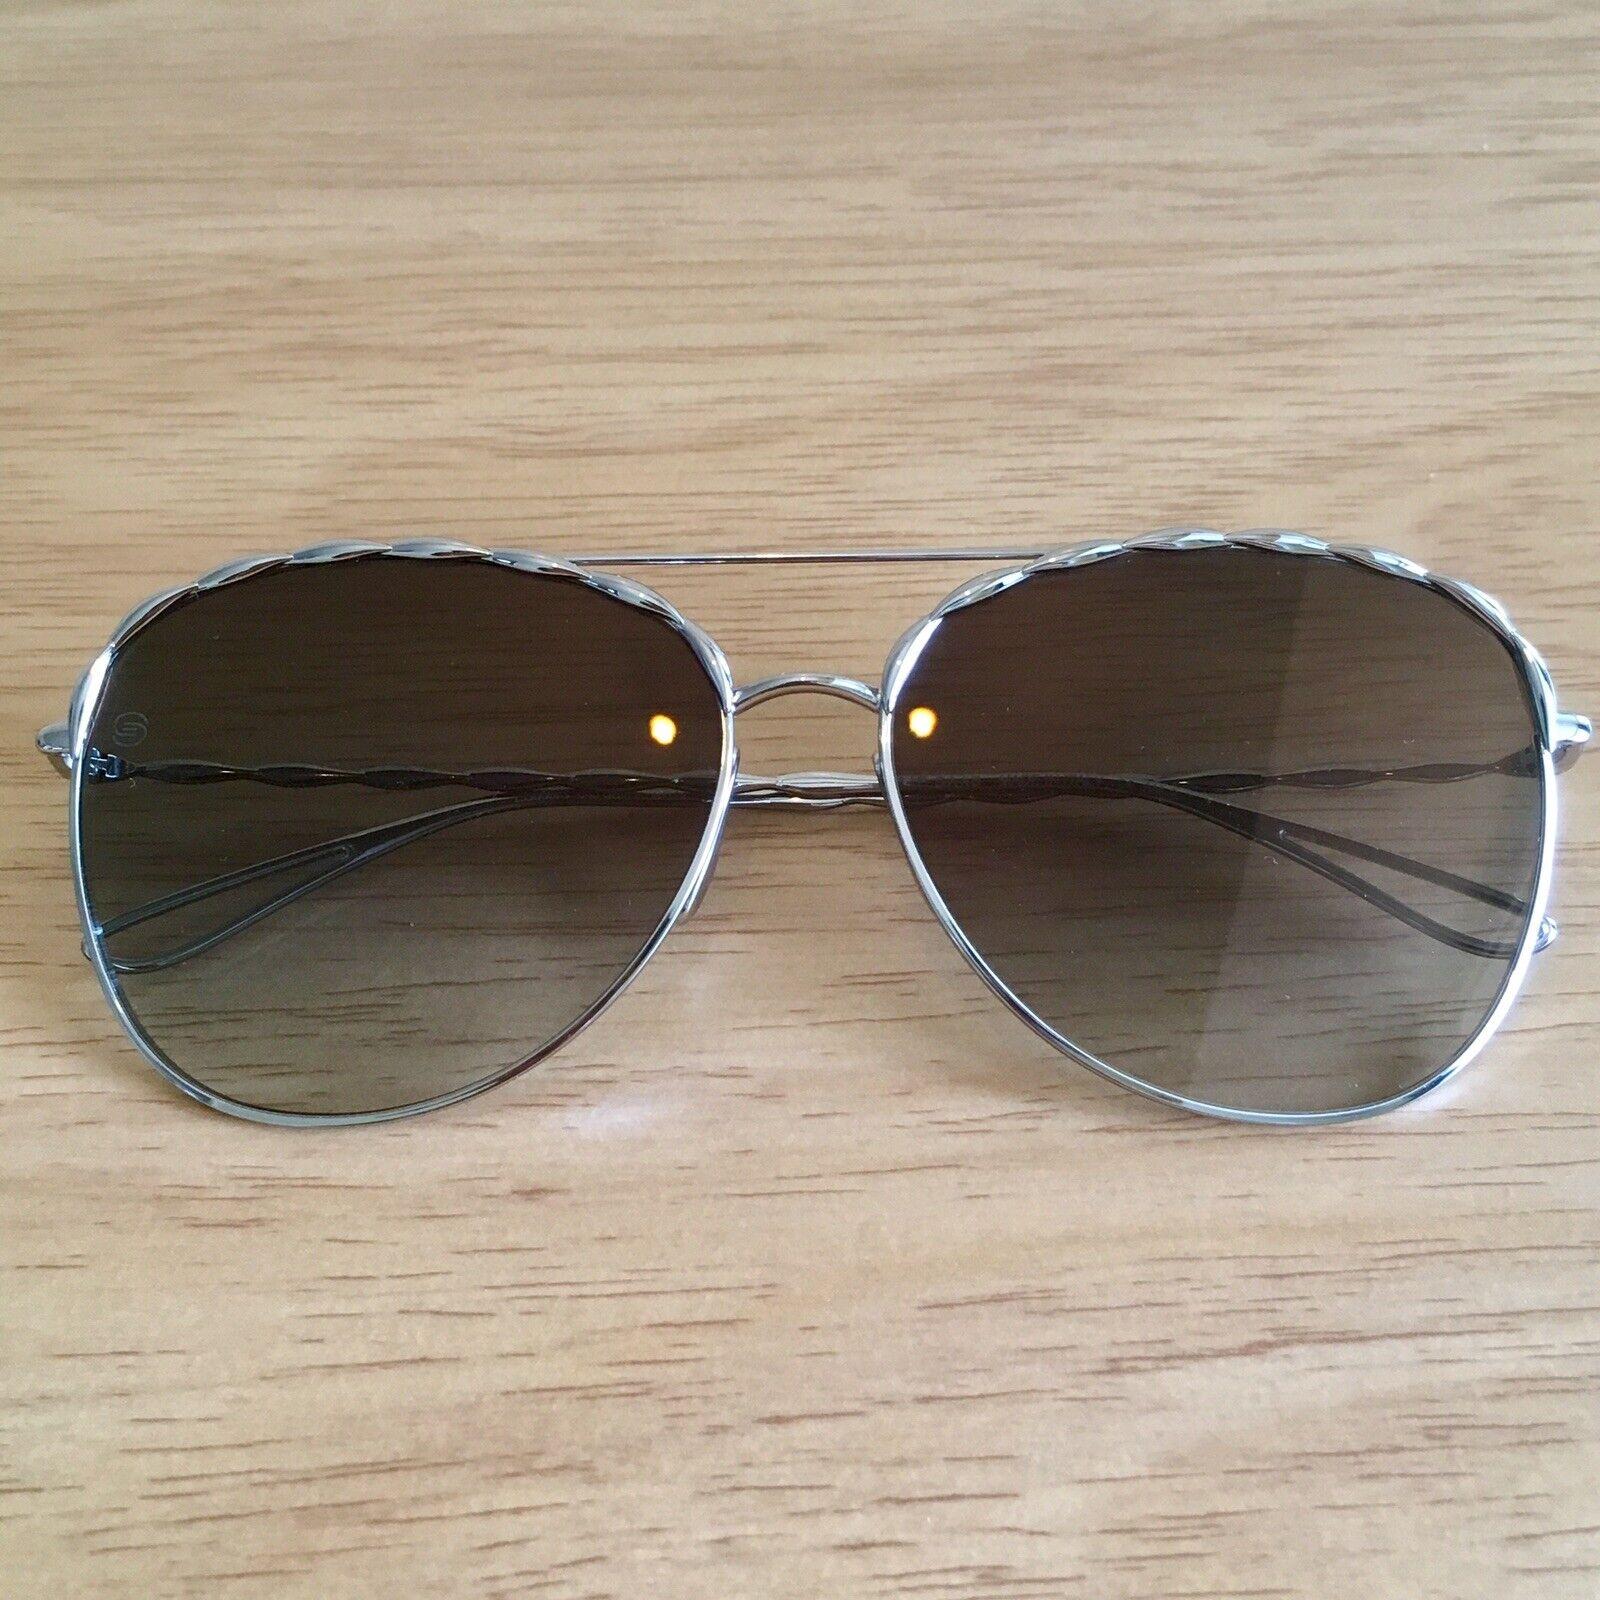 Authentic Brand New ELIE SAAB Silver Pilot Sunglasses ES008/S 84J 5B !